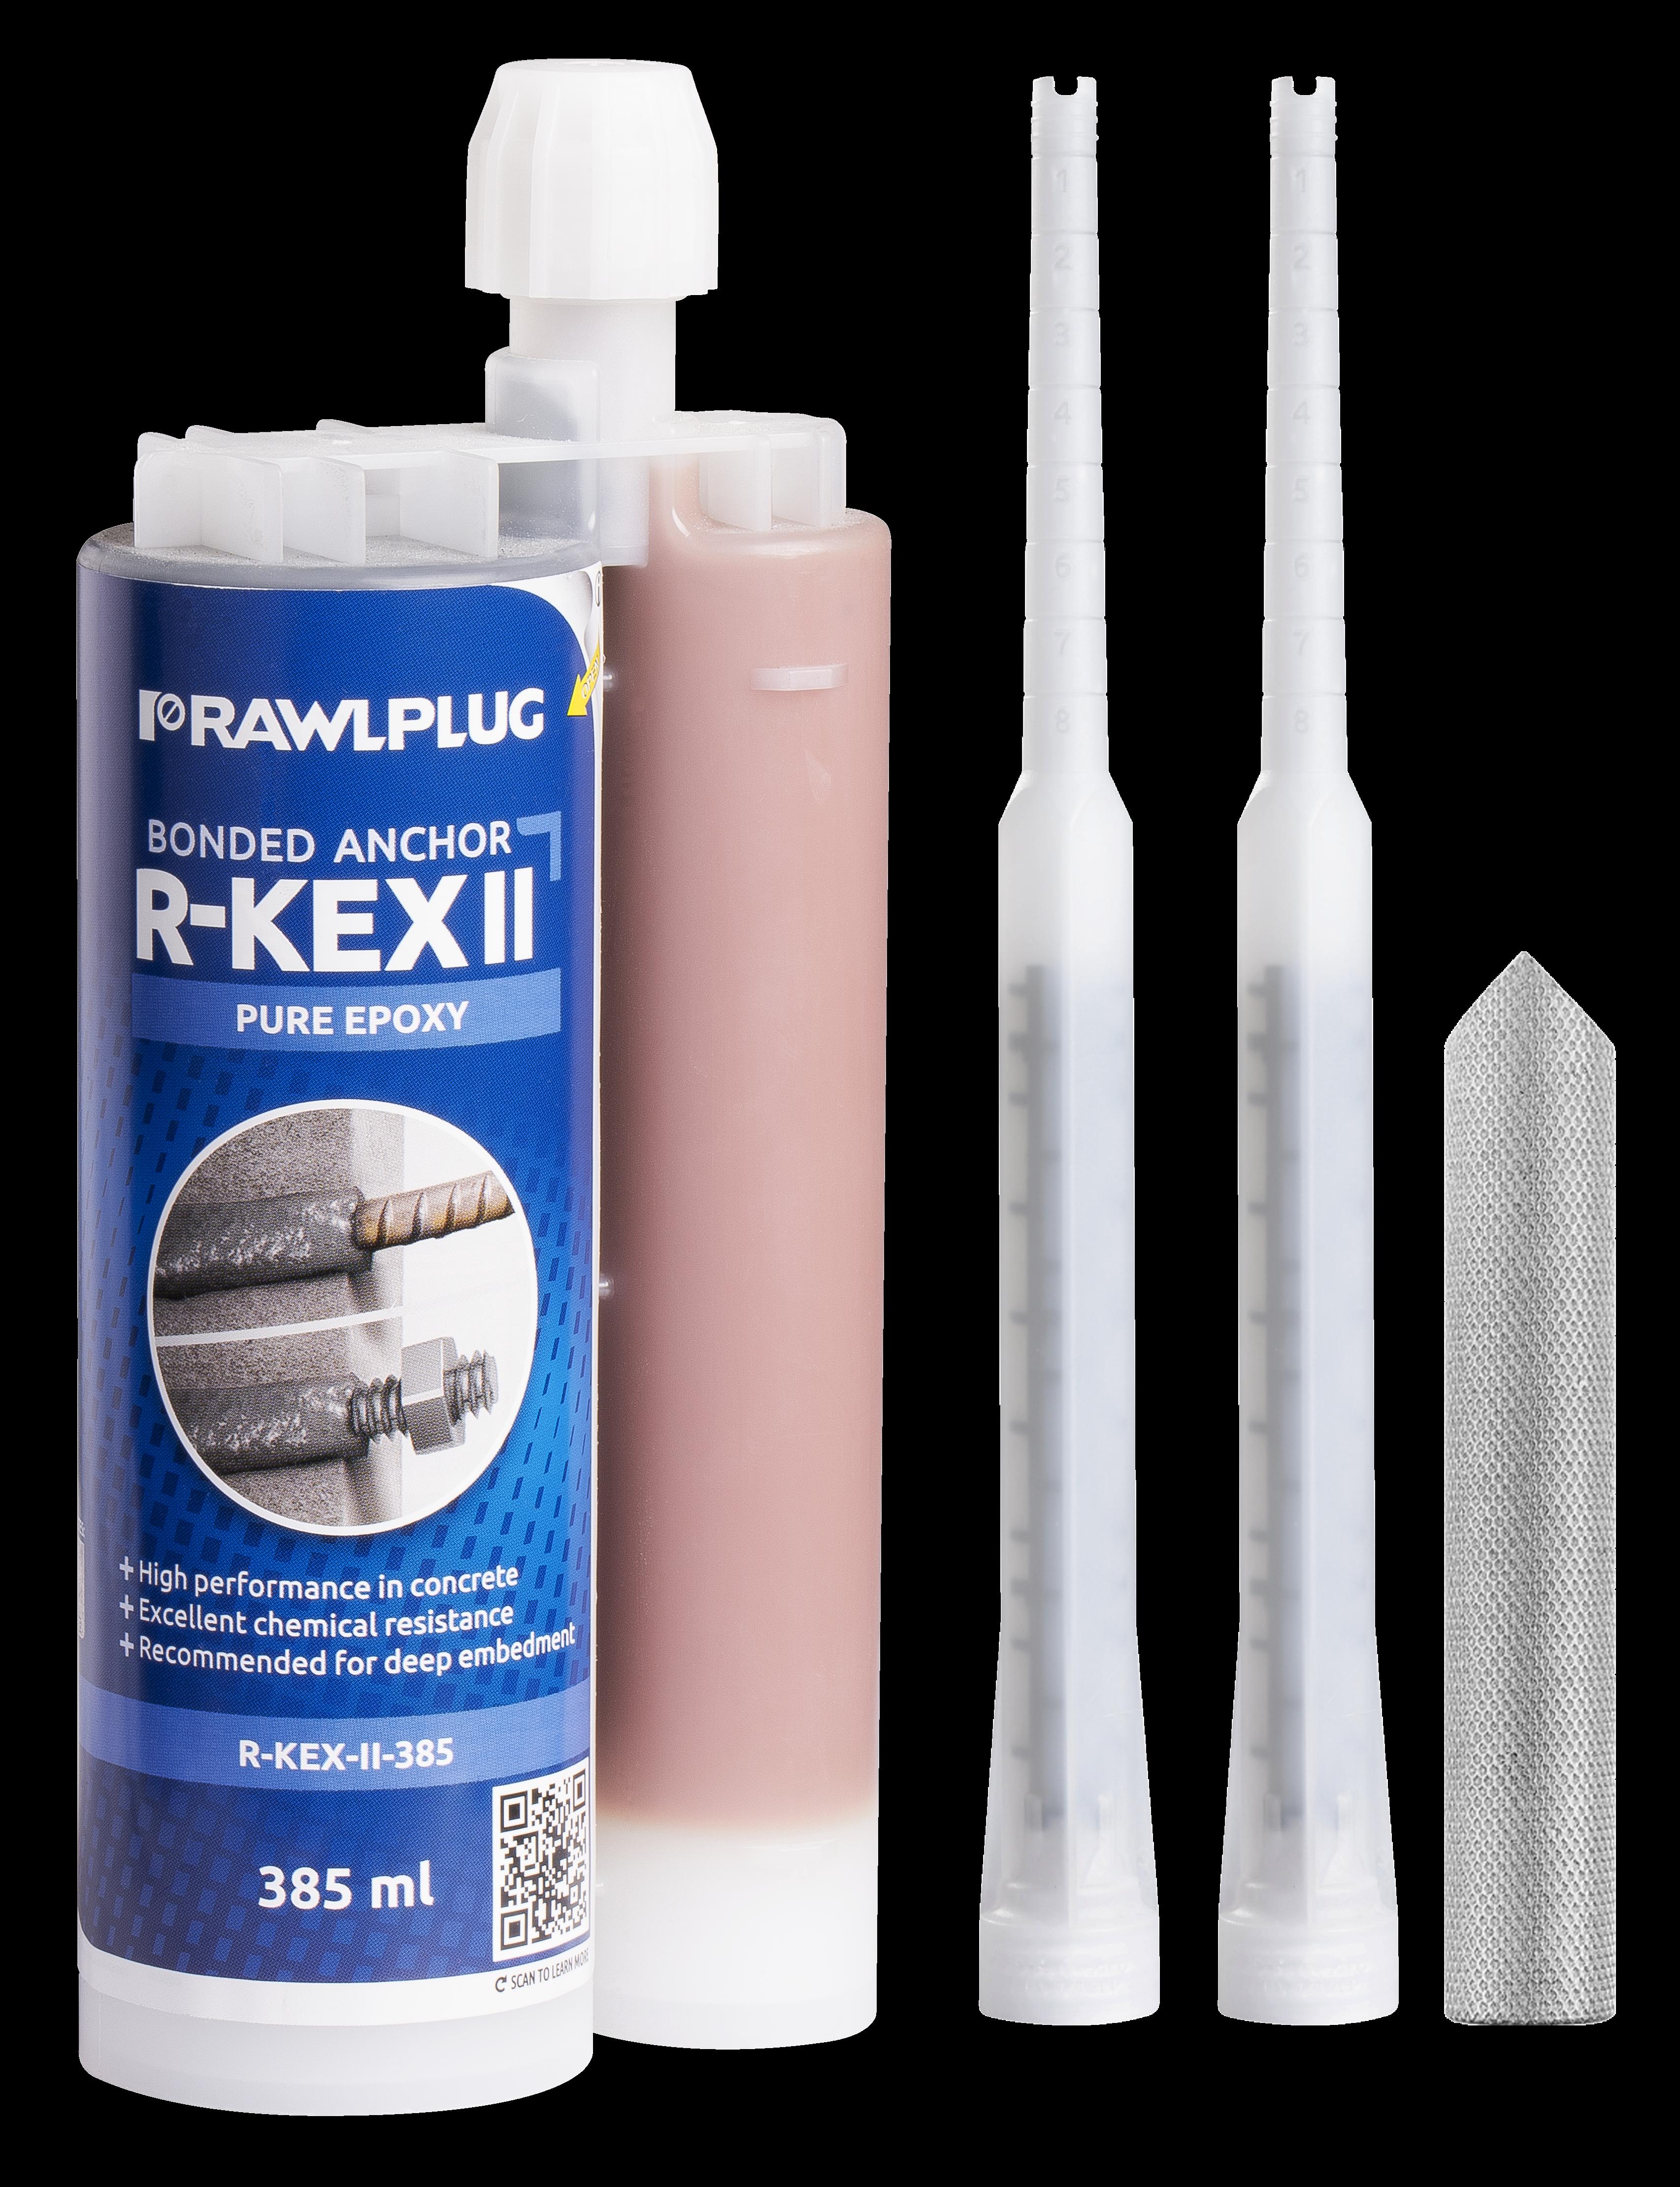 R-KEX II with Sockets